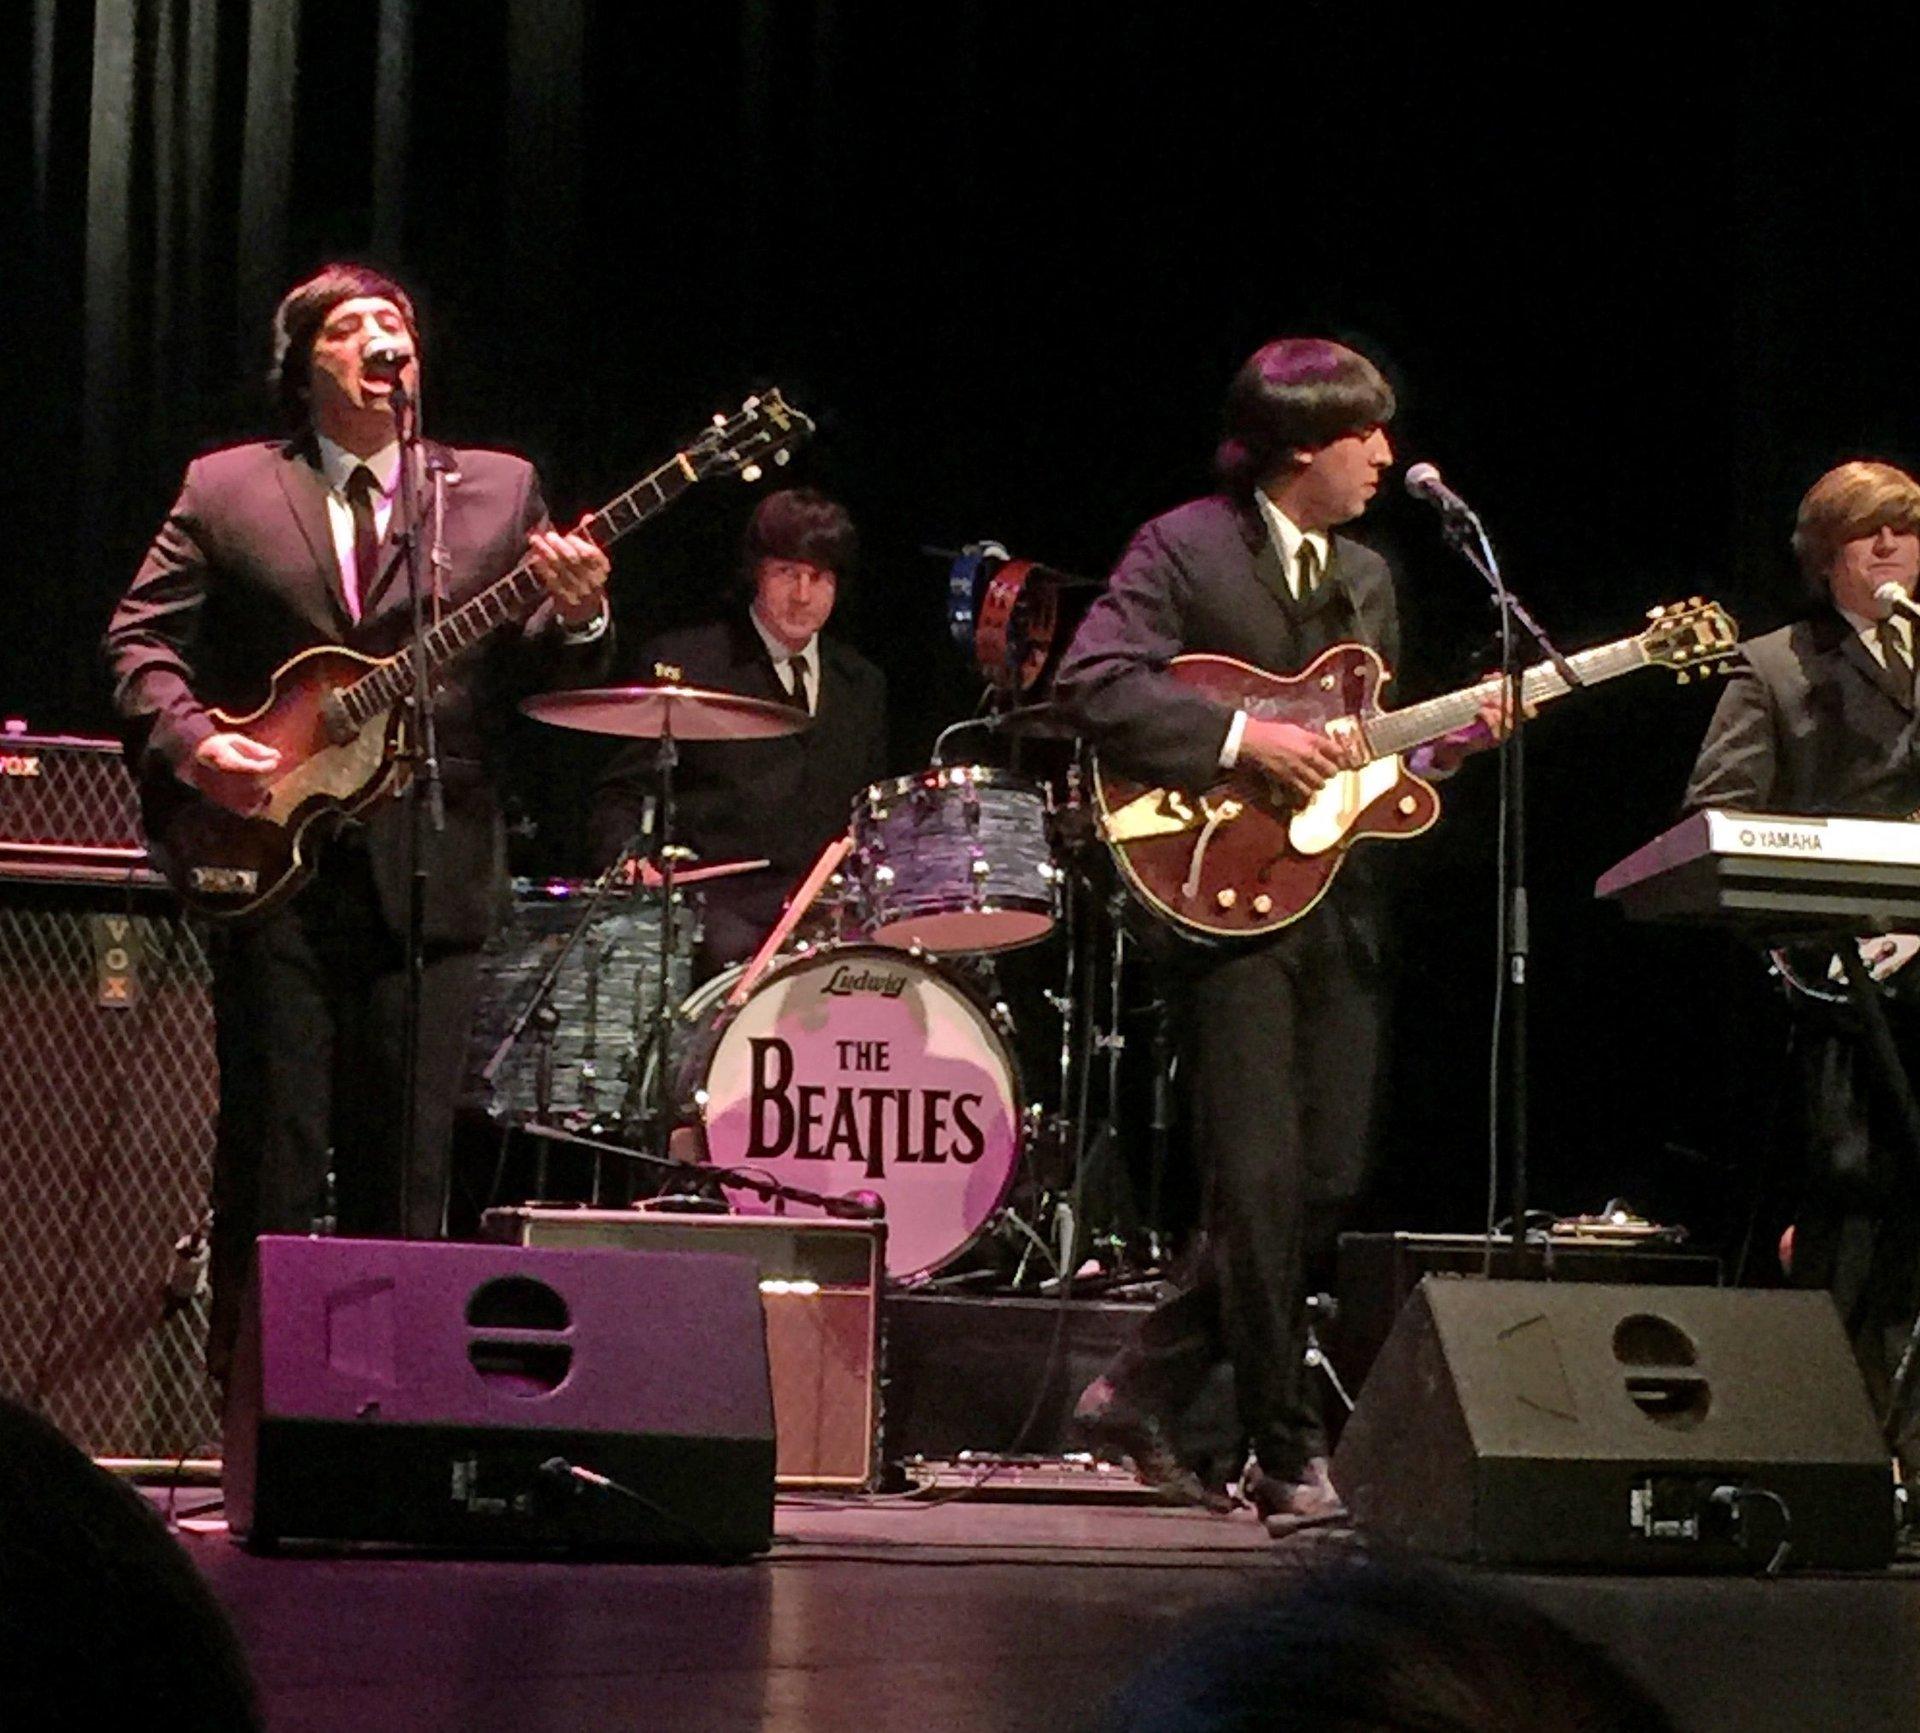 Beatles' tribute band